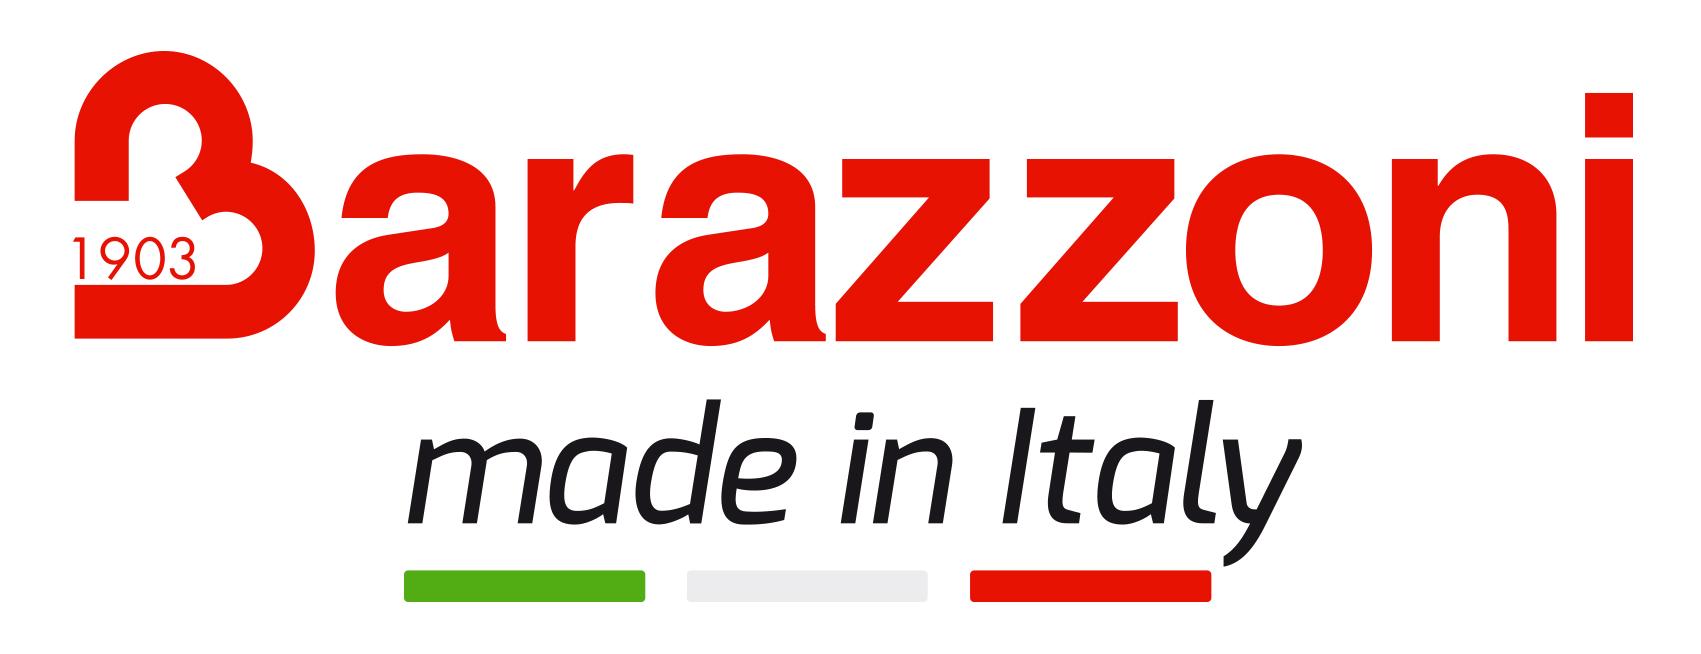 Barazzoni Spa | Monzani Trasporti